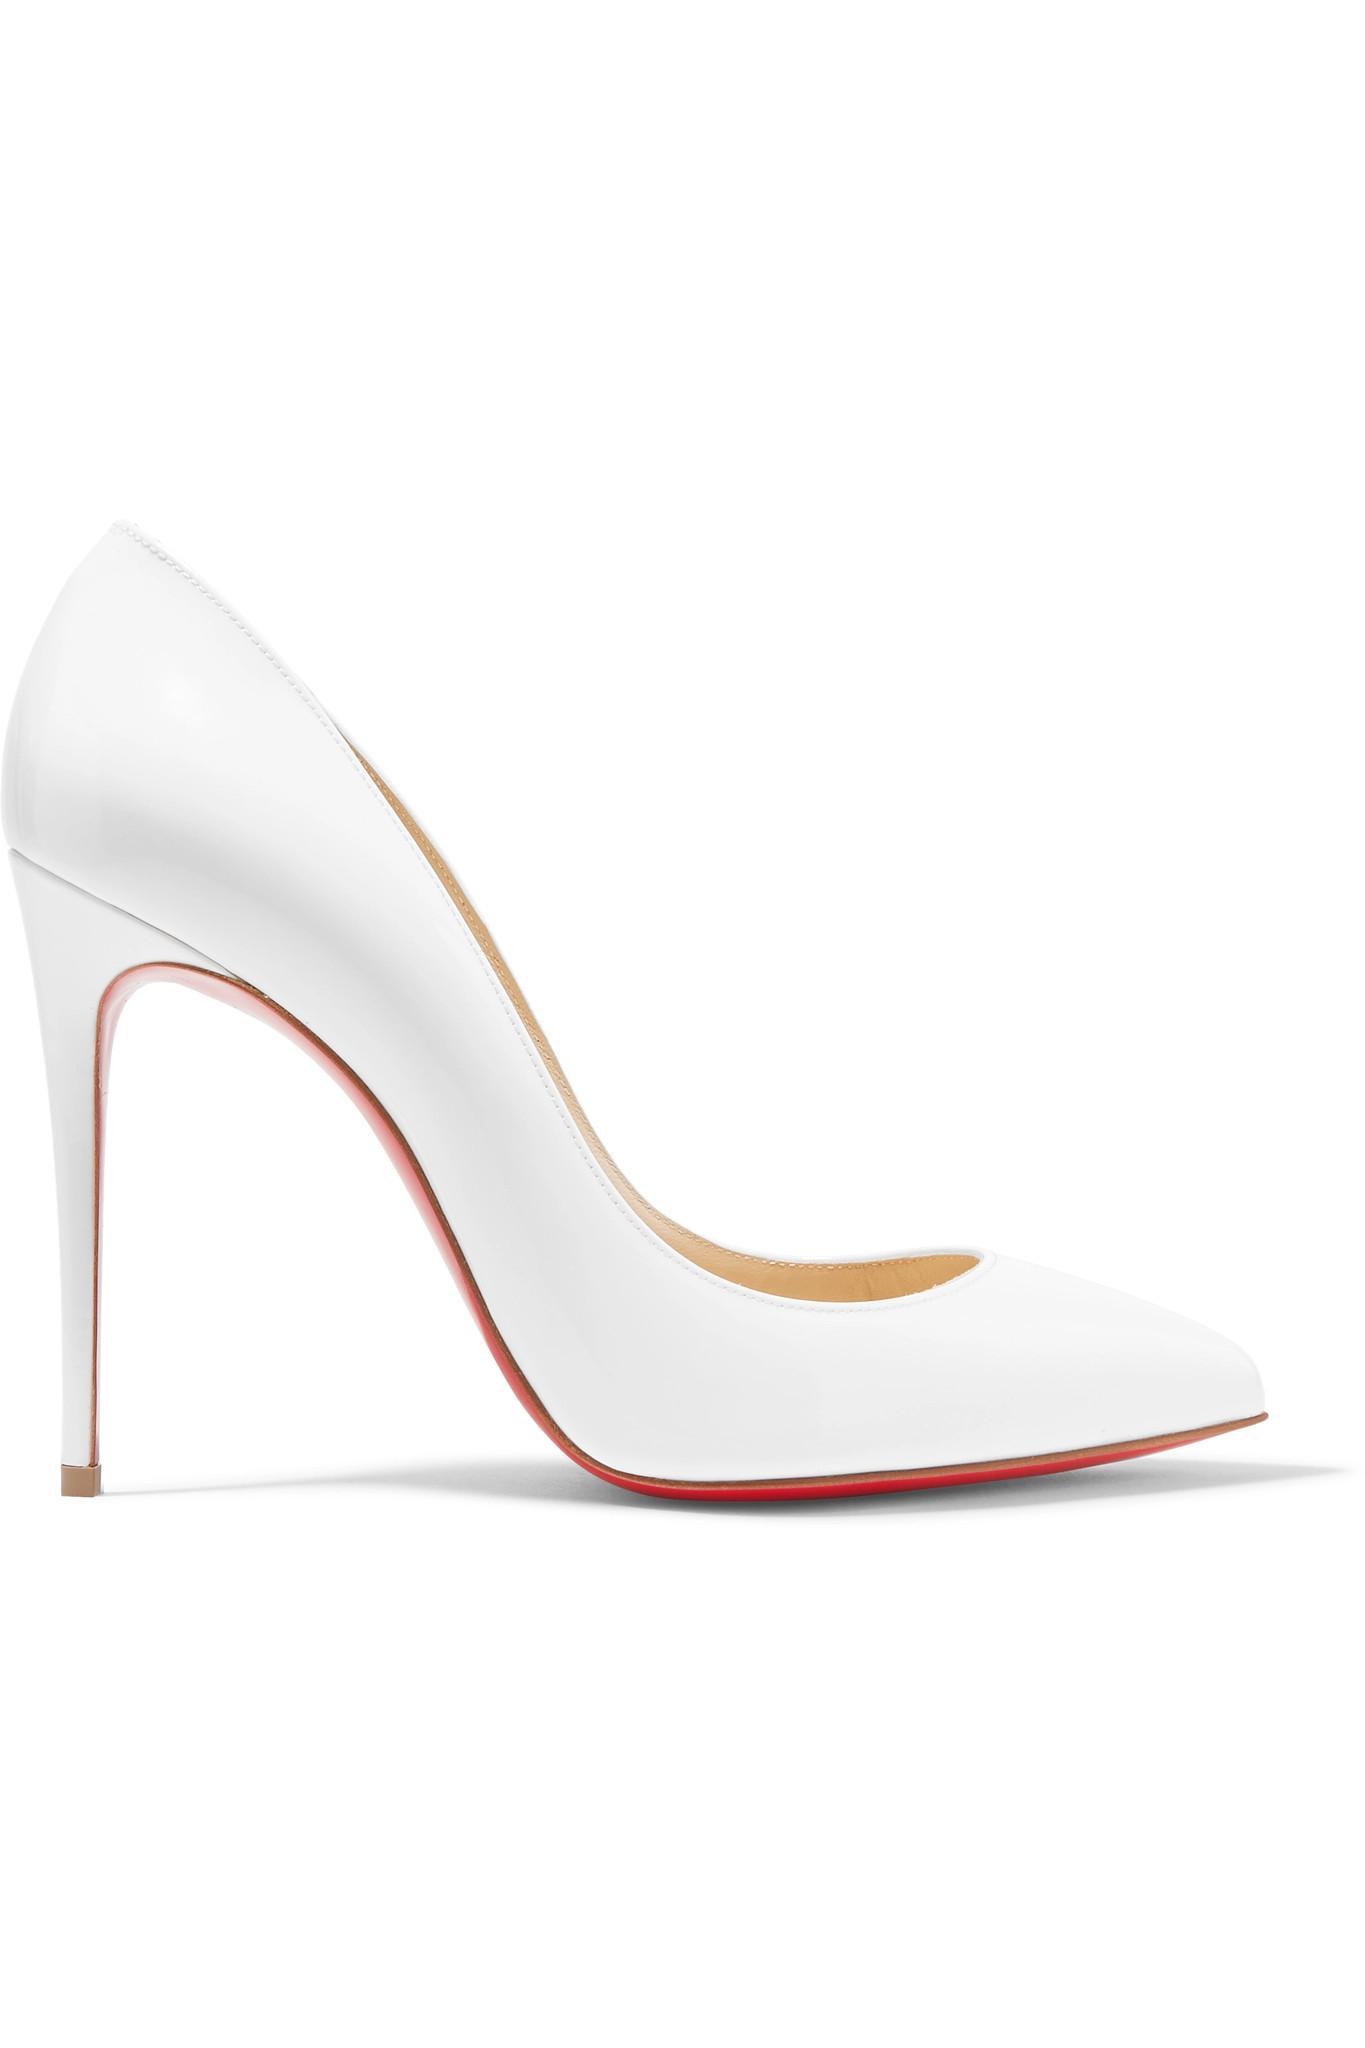 0ad881e3e8f2 Christian Louboutin. Women s White Pigalle Follies 100 Patent-leather Pumps